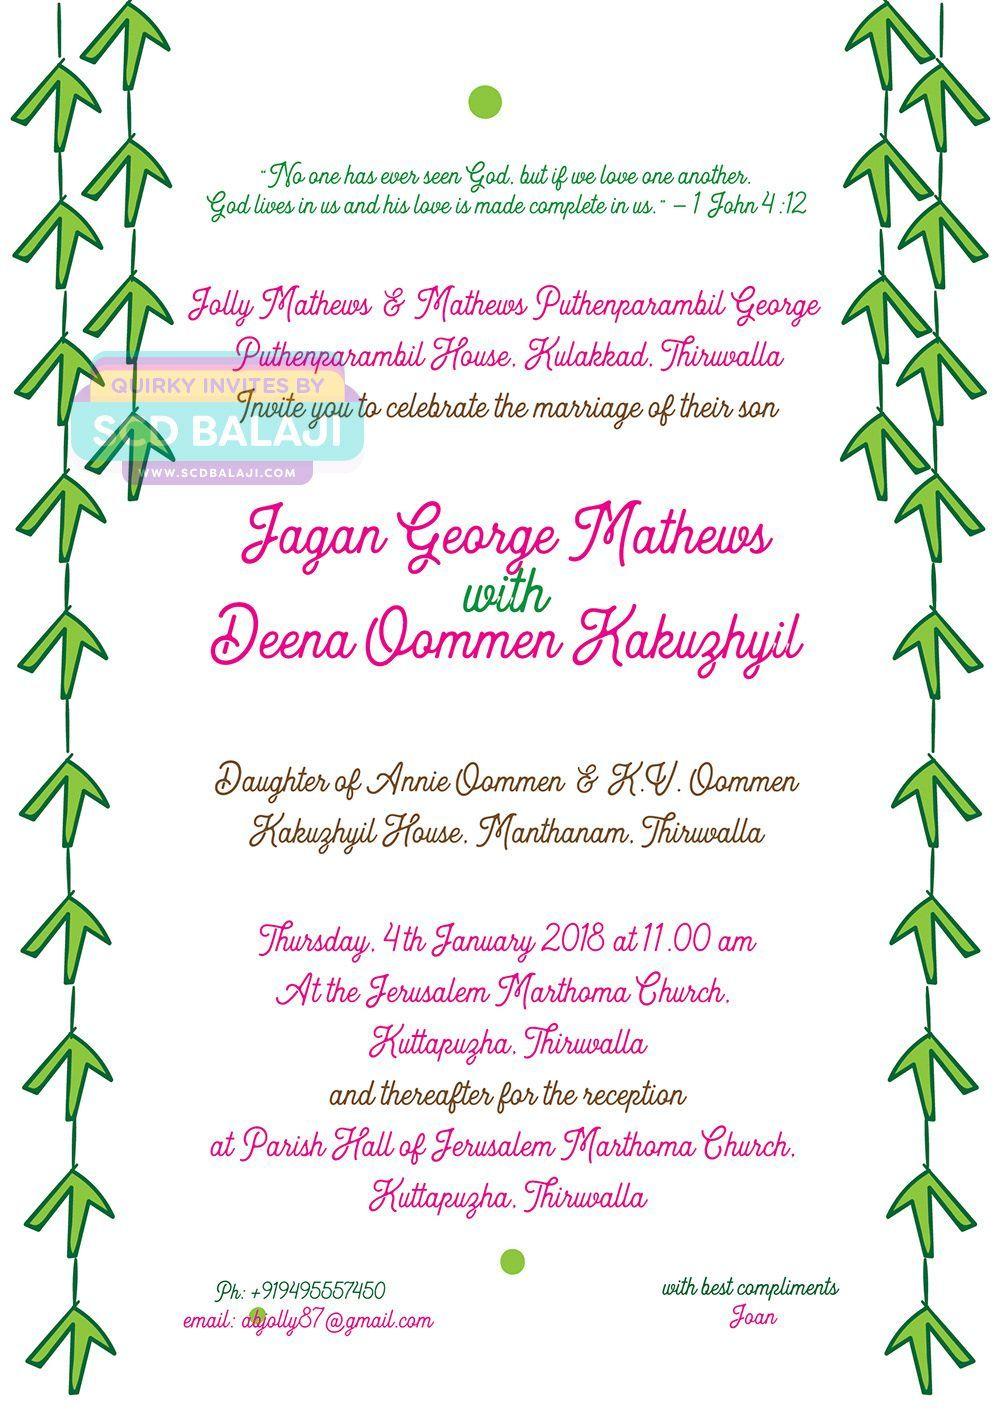 17 Beautiful Marriage Invitation Card Kerala Photos Christian Wedding Invitations Marriage Invitation Card Christian Wedding Cards